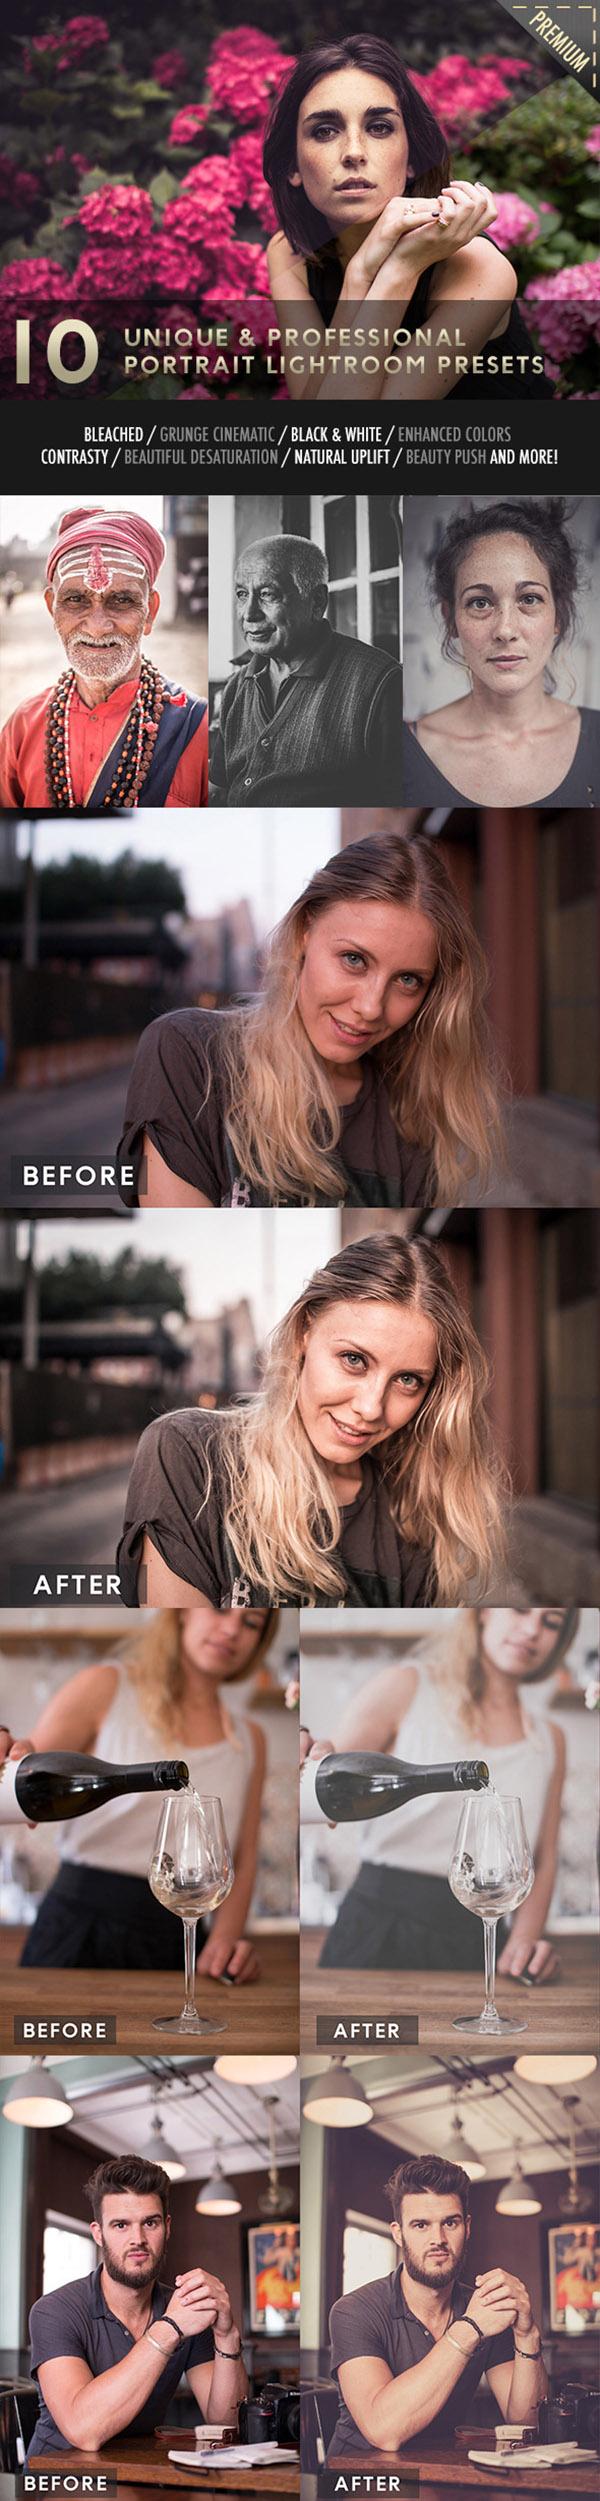 03 10 Portrait Photography Lightroom Presets